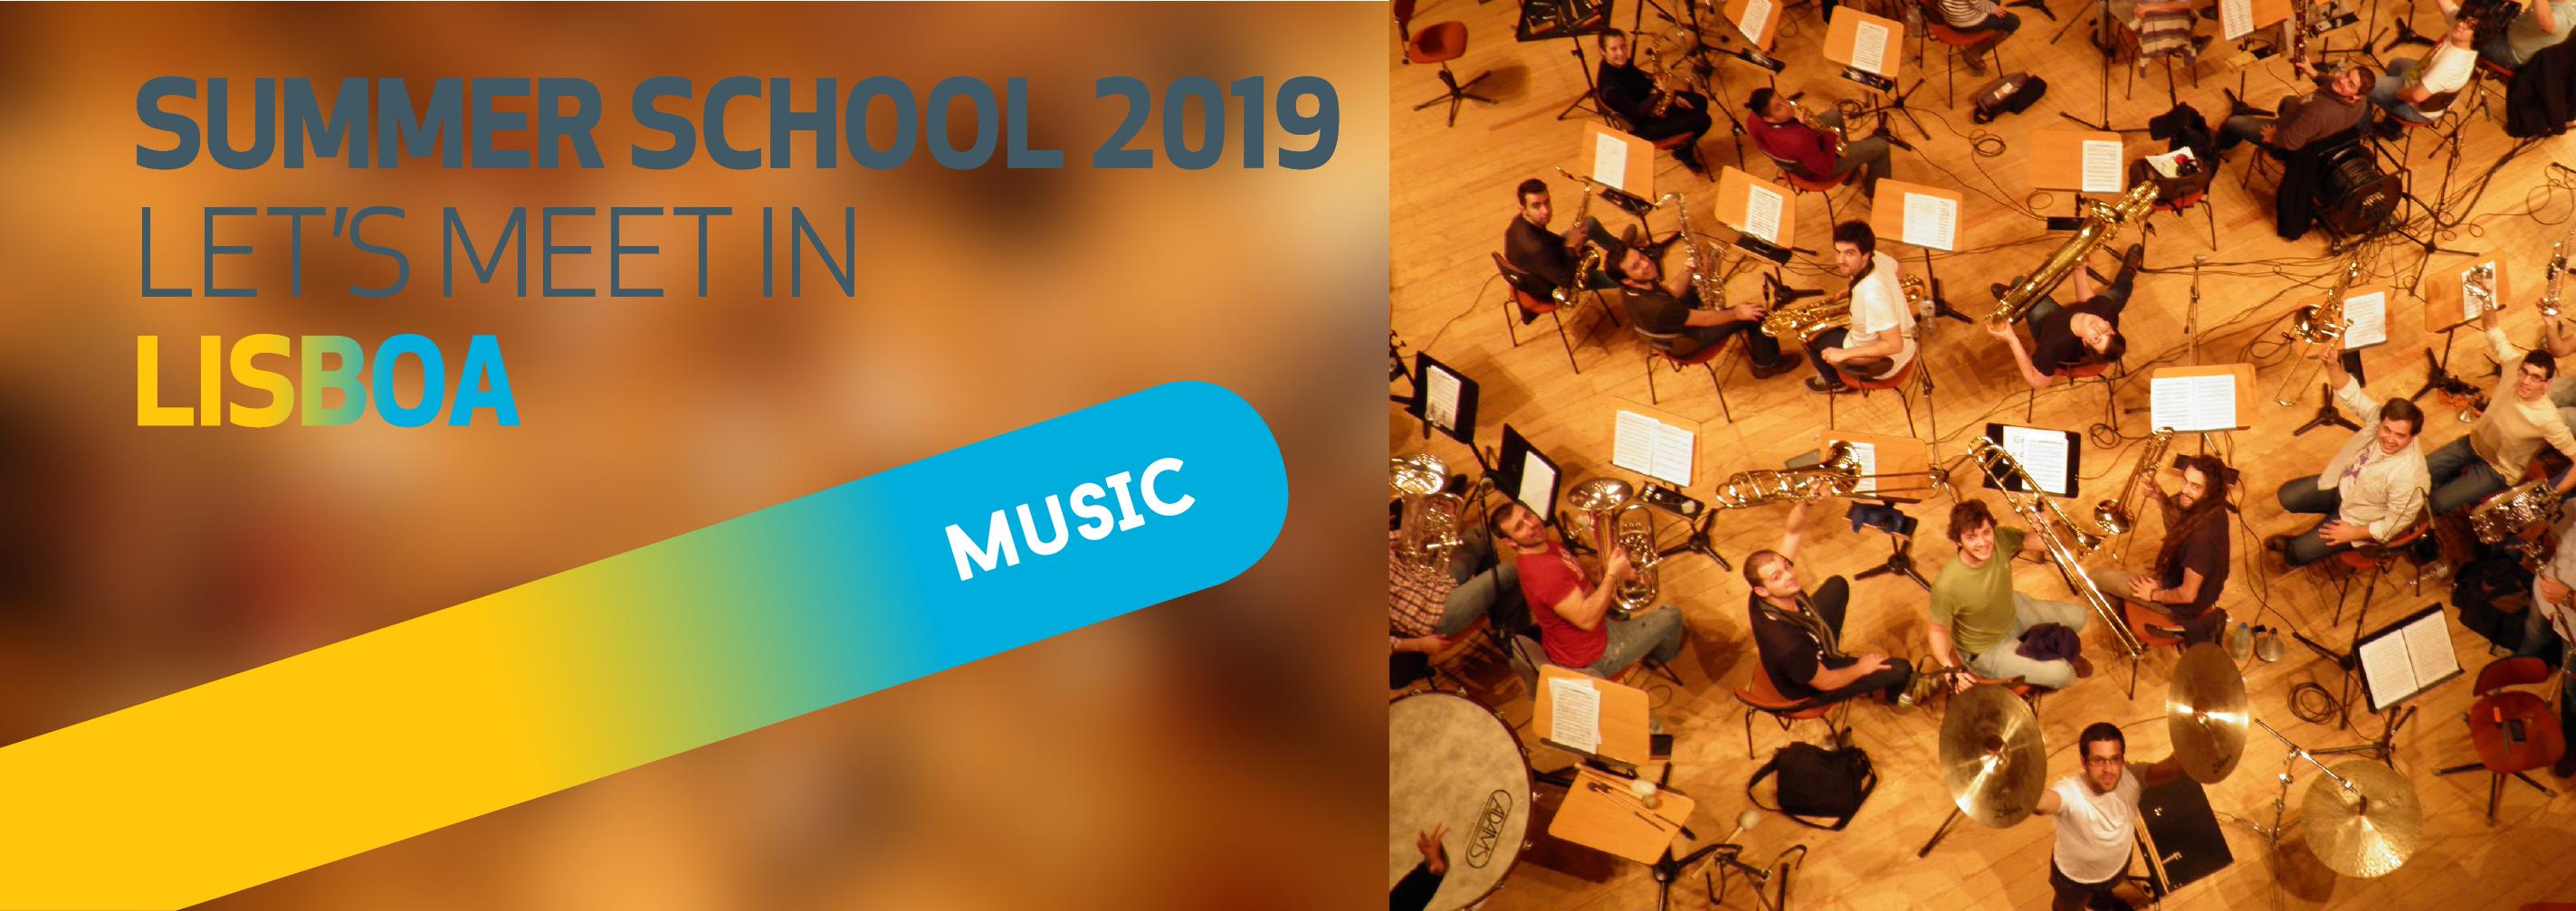 Summer School 2019 - Music